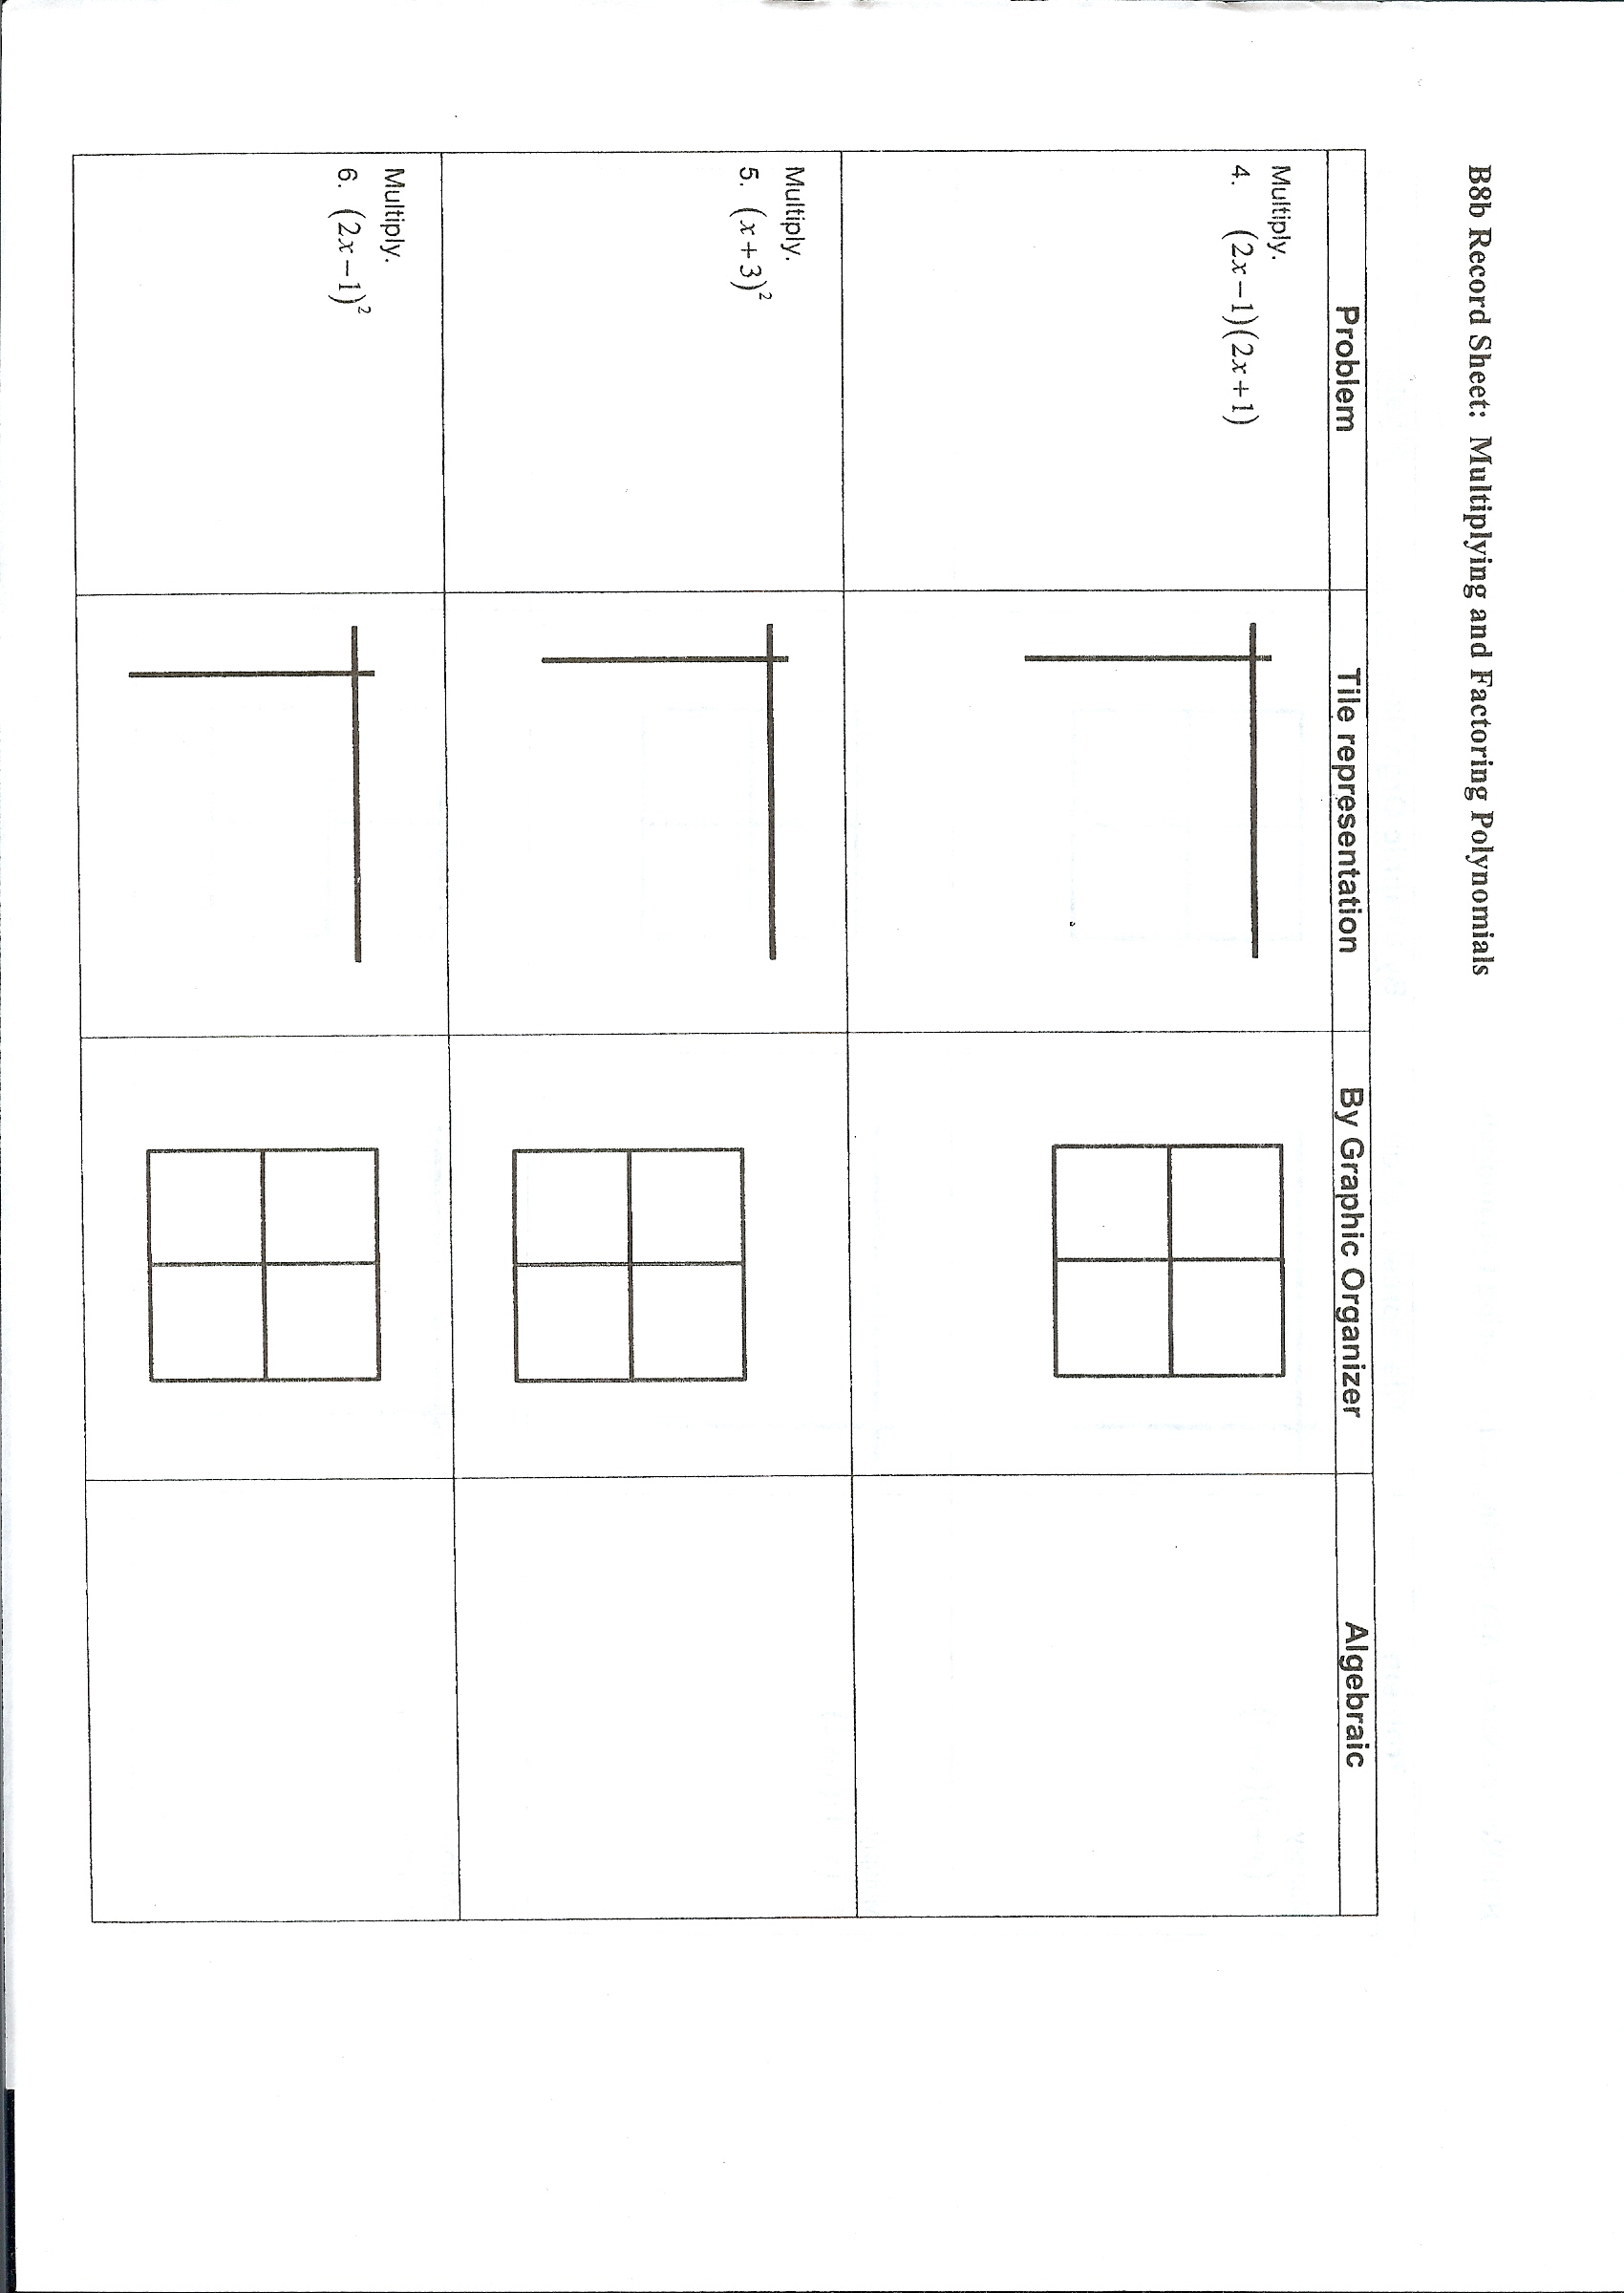 Worksheets Algebra Tiles Worksheet solving equations using algebra tiles worksheets free expanding brackets solve my maths two step tiles